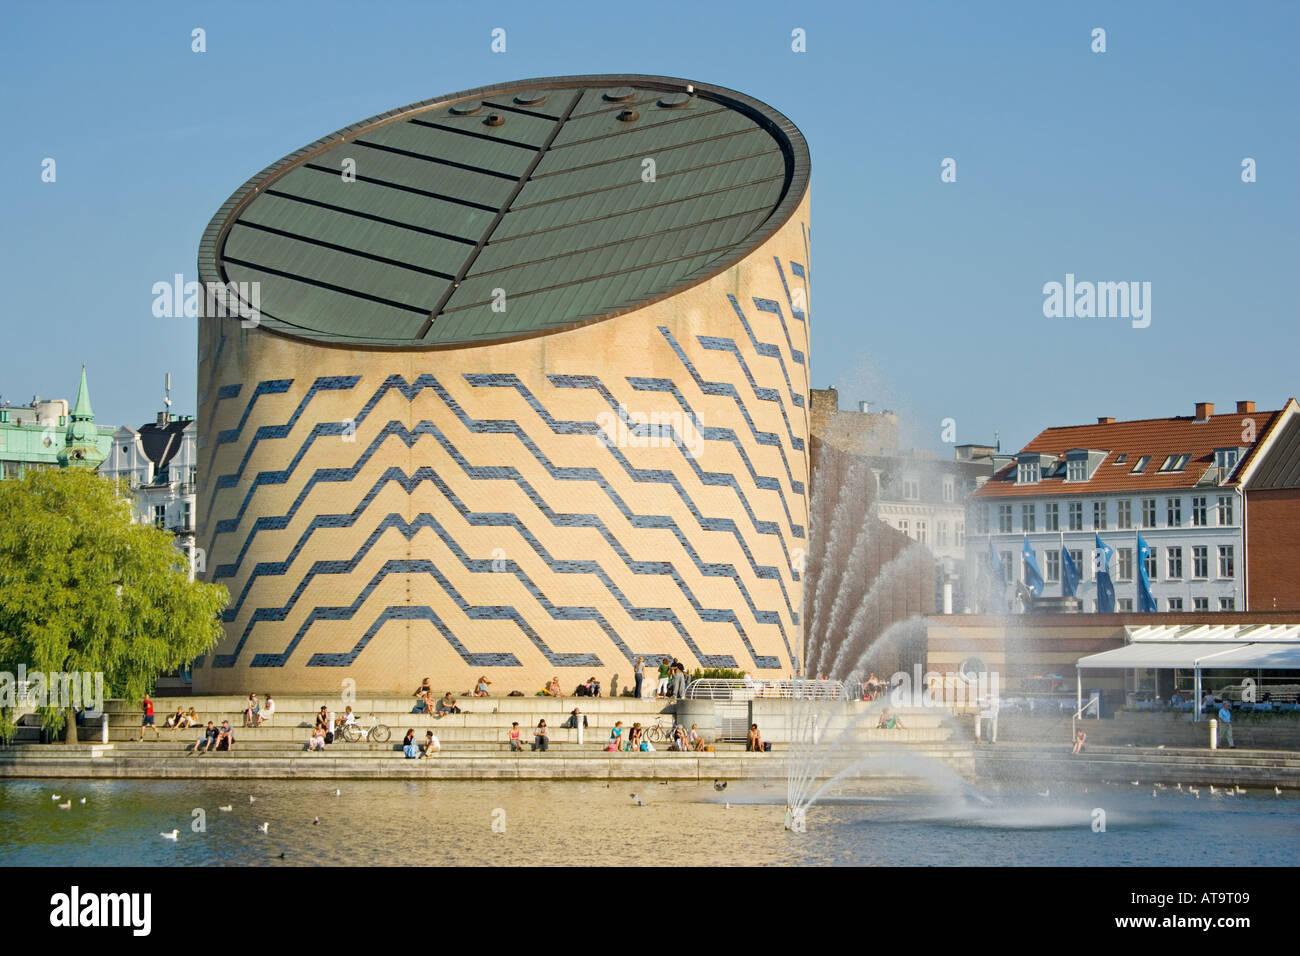 Copenhagen Denmark Tycho Brahe Planetarium on Sankt Jorgens So - Stock Image